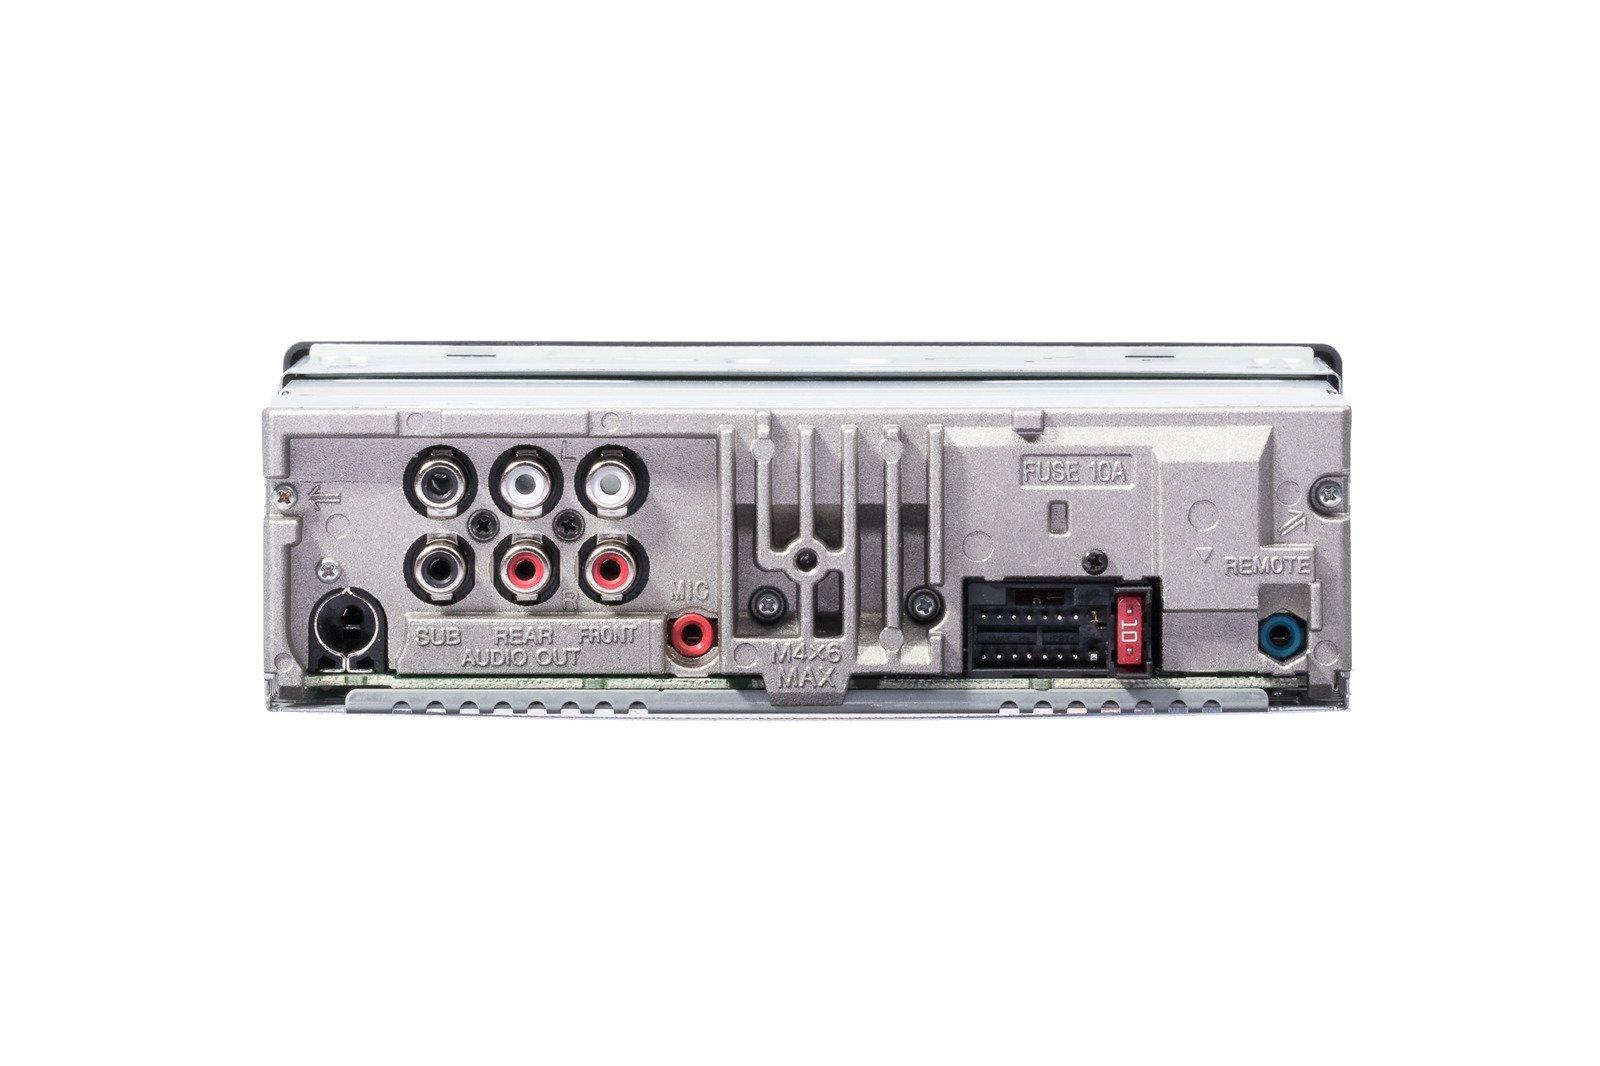 Sony Mex N5100bt Car Radio Cd Mp3 Usb 4x55watt Grade B Replacement Fuse Box